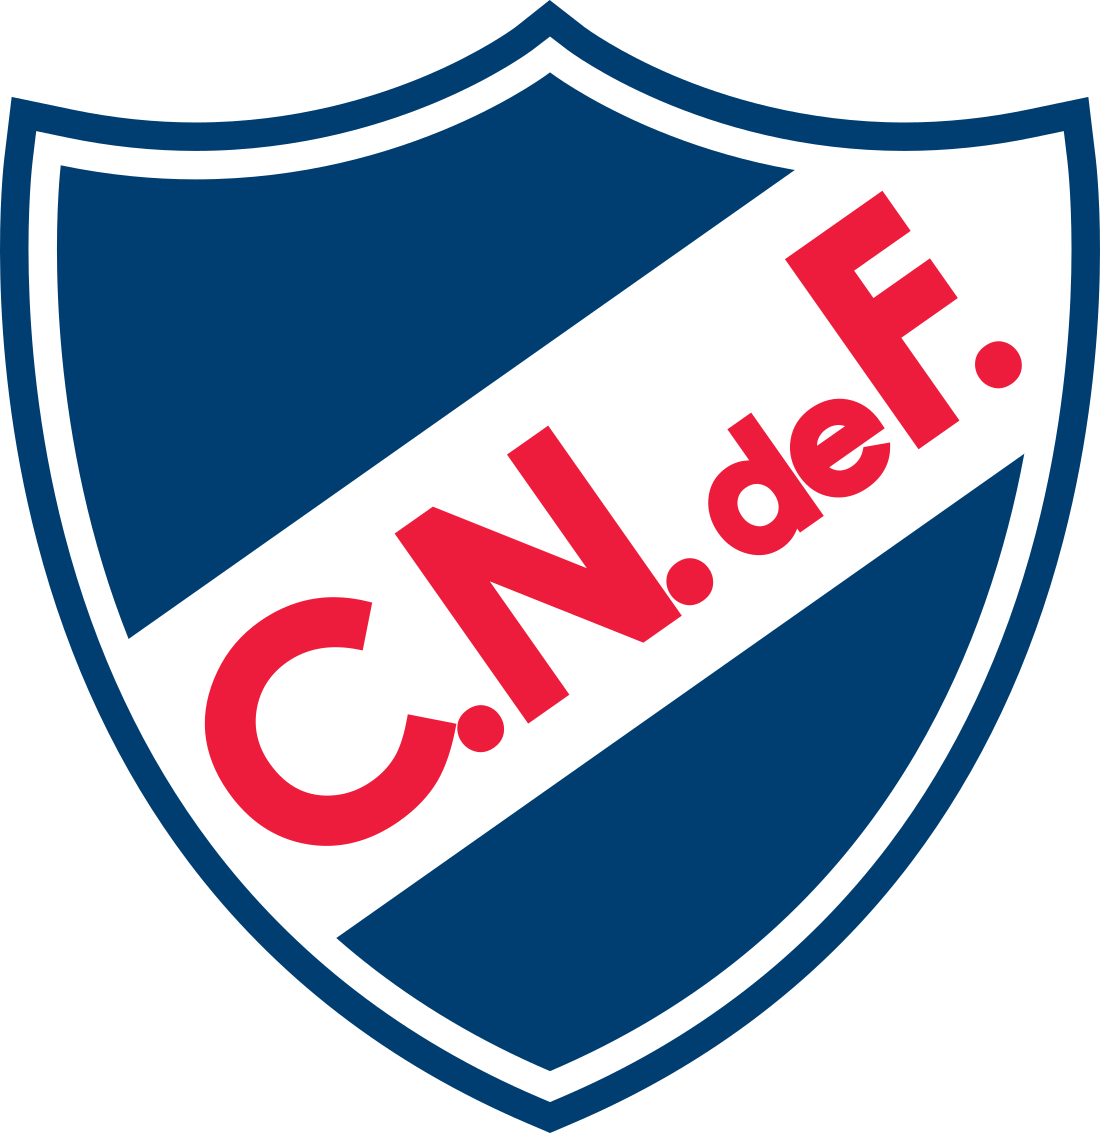 nacional-do-uruguai-logo-escudo-3